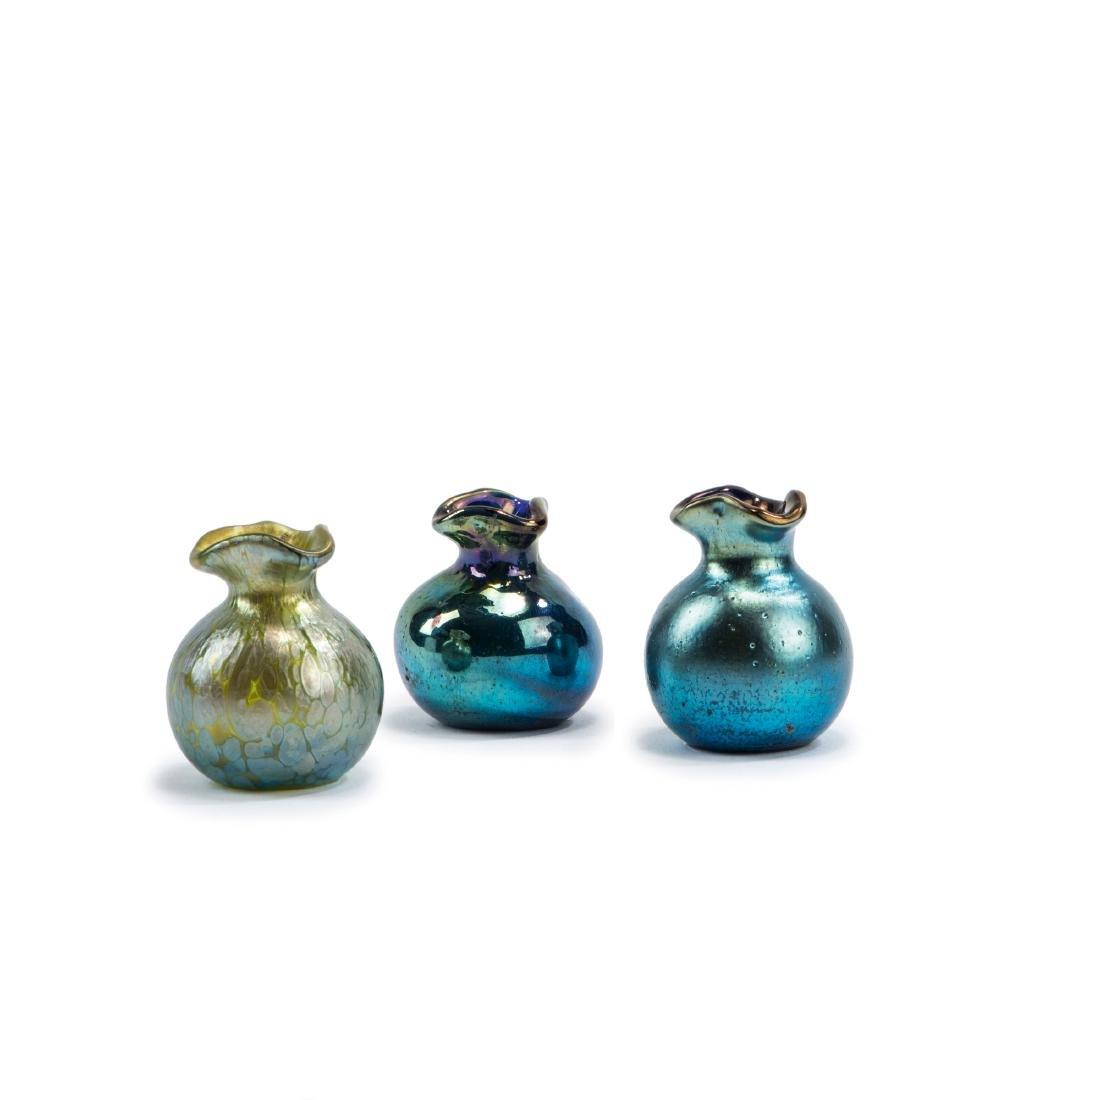 Three miniature vases, c1900